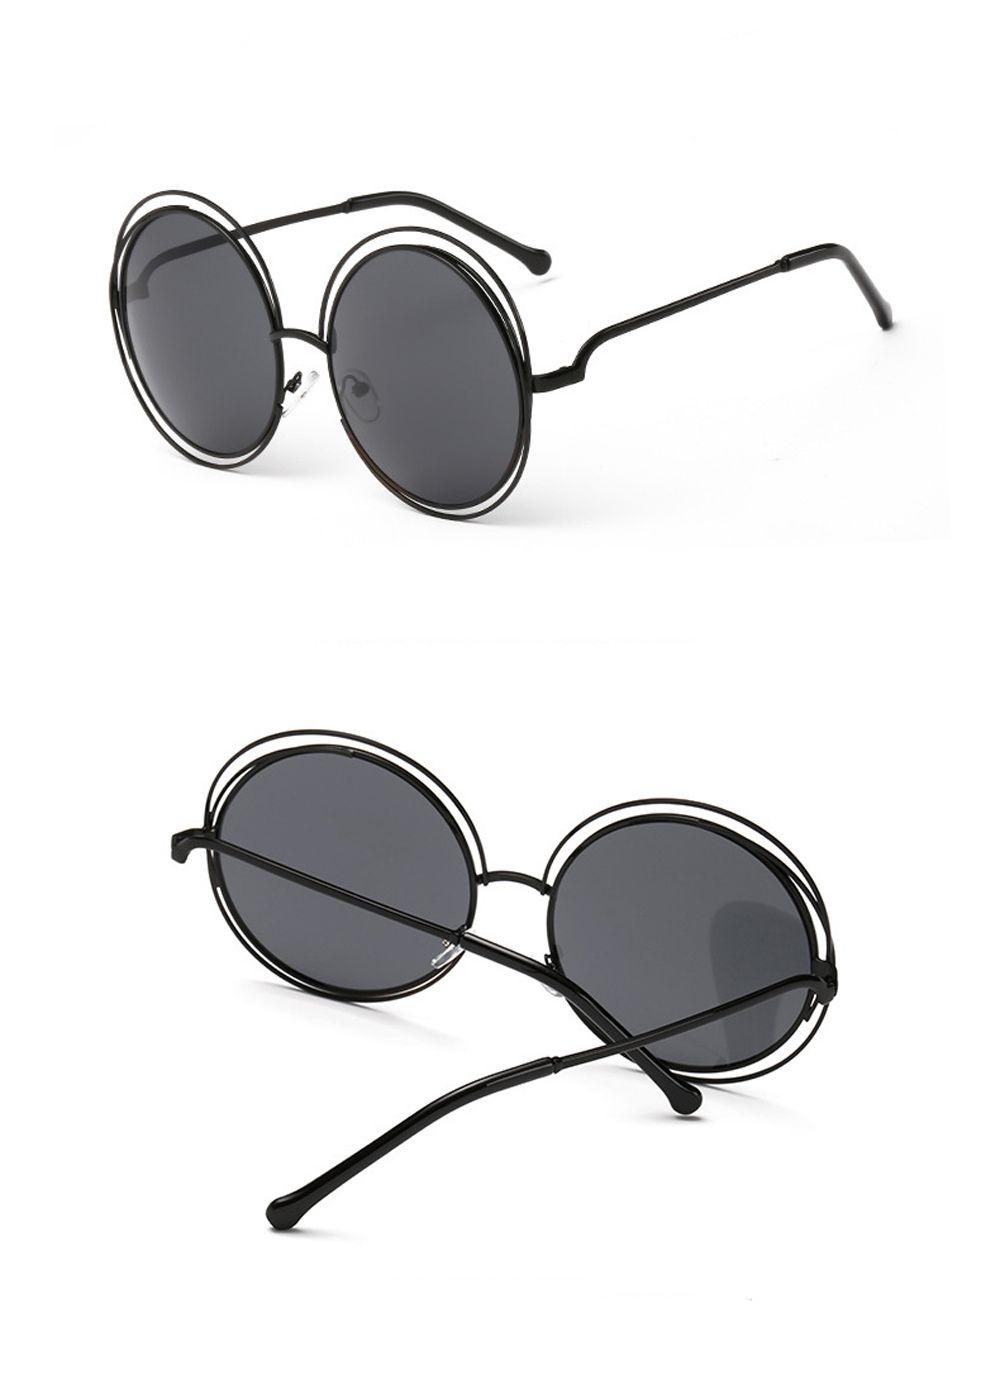 Vintage Round Big Size Oversized lens Mirror Sunglasses